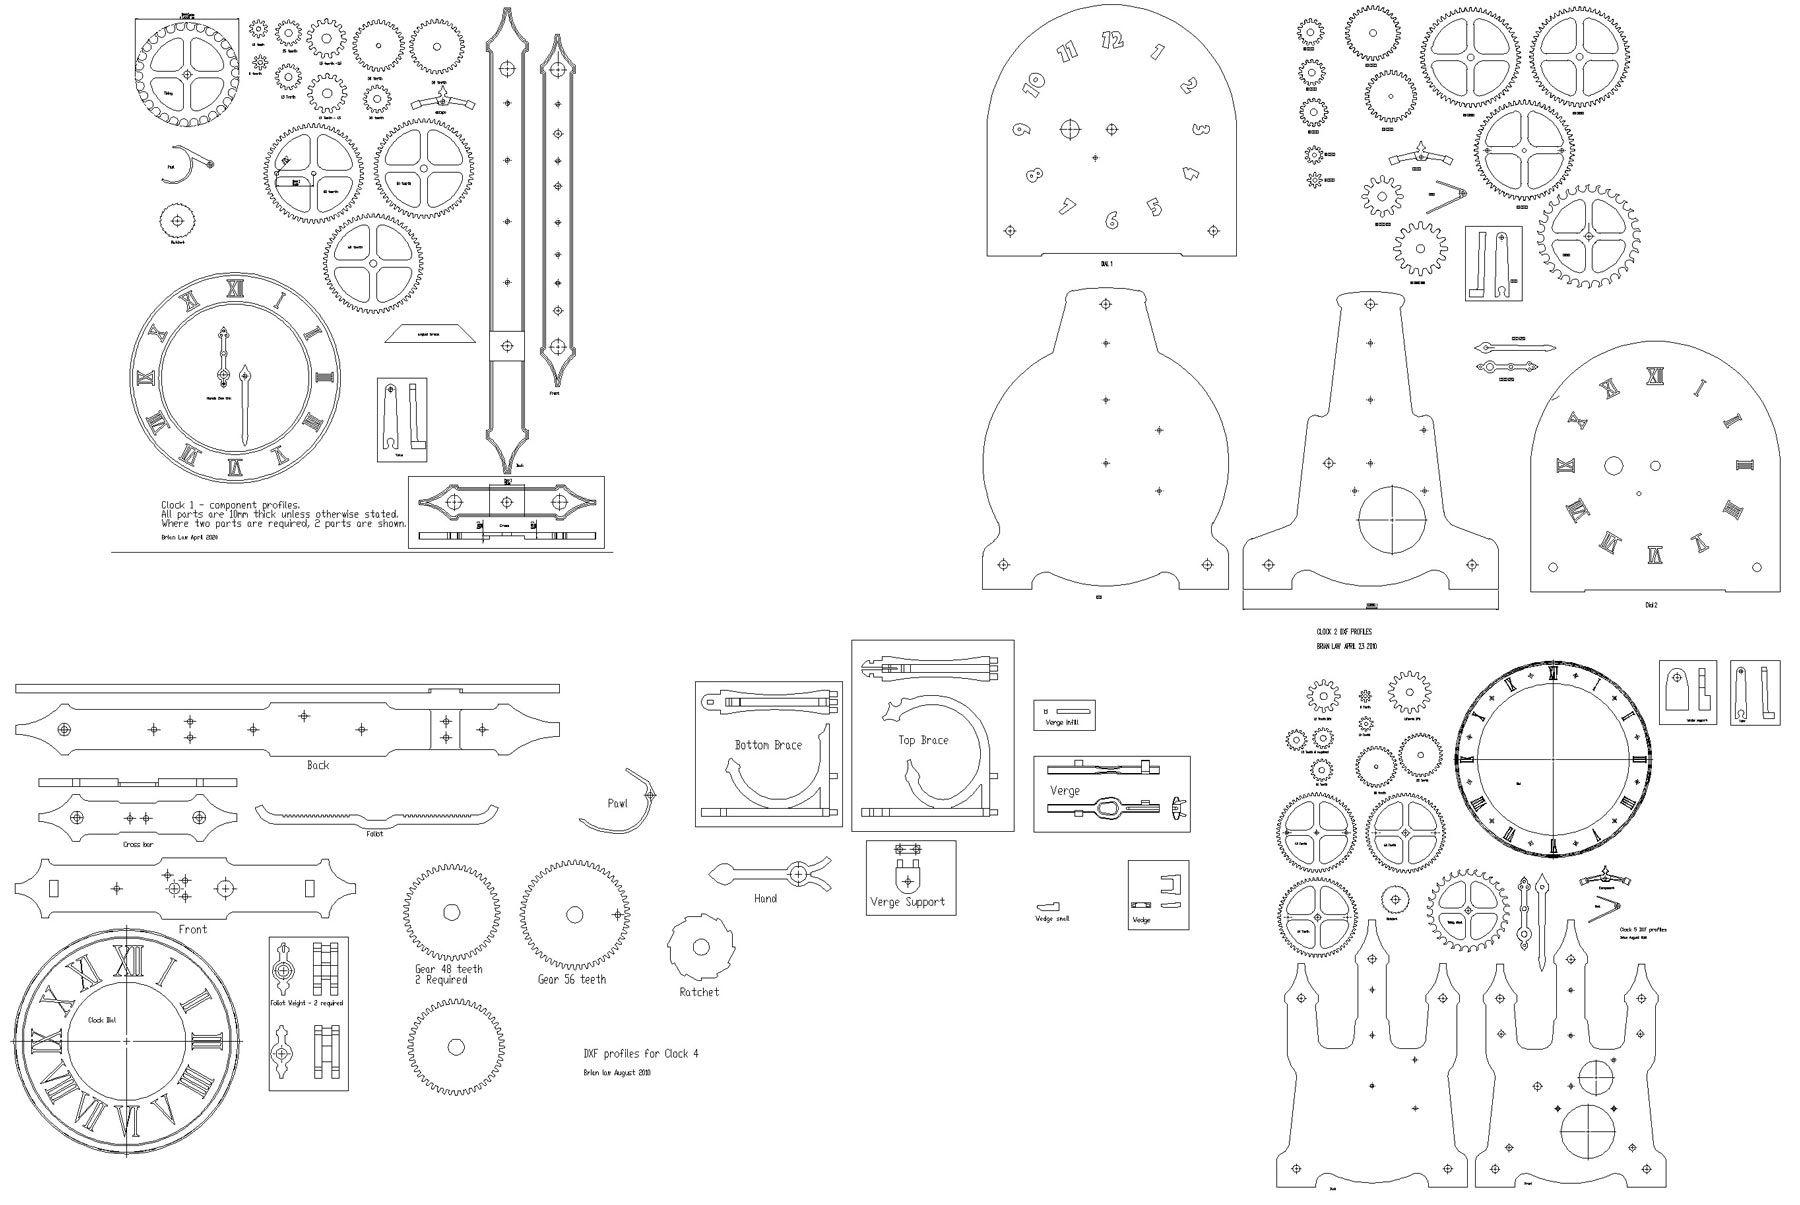 Clock 21 Profile Cuts  Router Cutter Version Layers Blue Green |  Oscarroyav | Pinterest | Wooden Clock, Clocks And Wooden Clock Plans